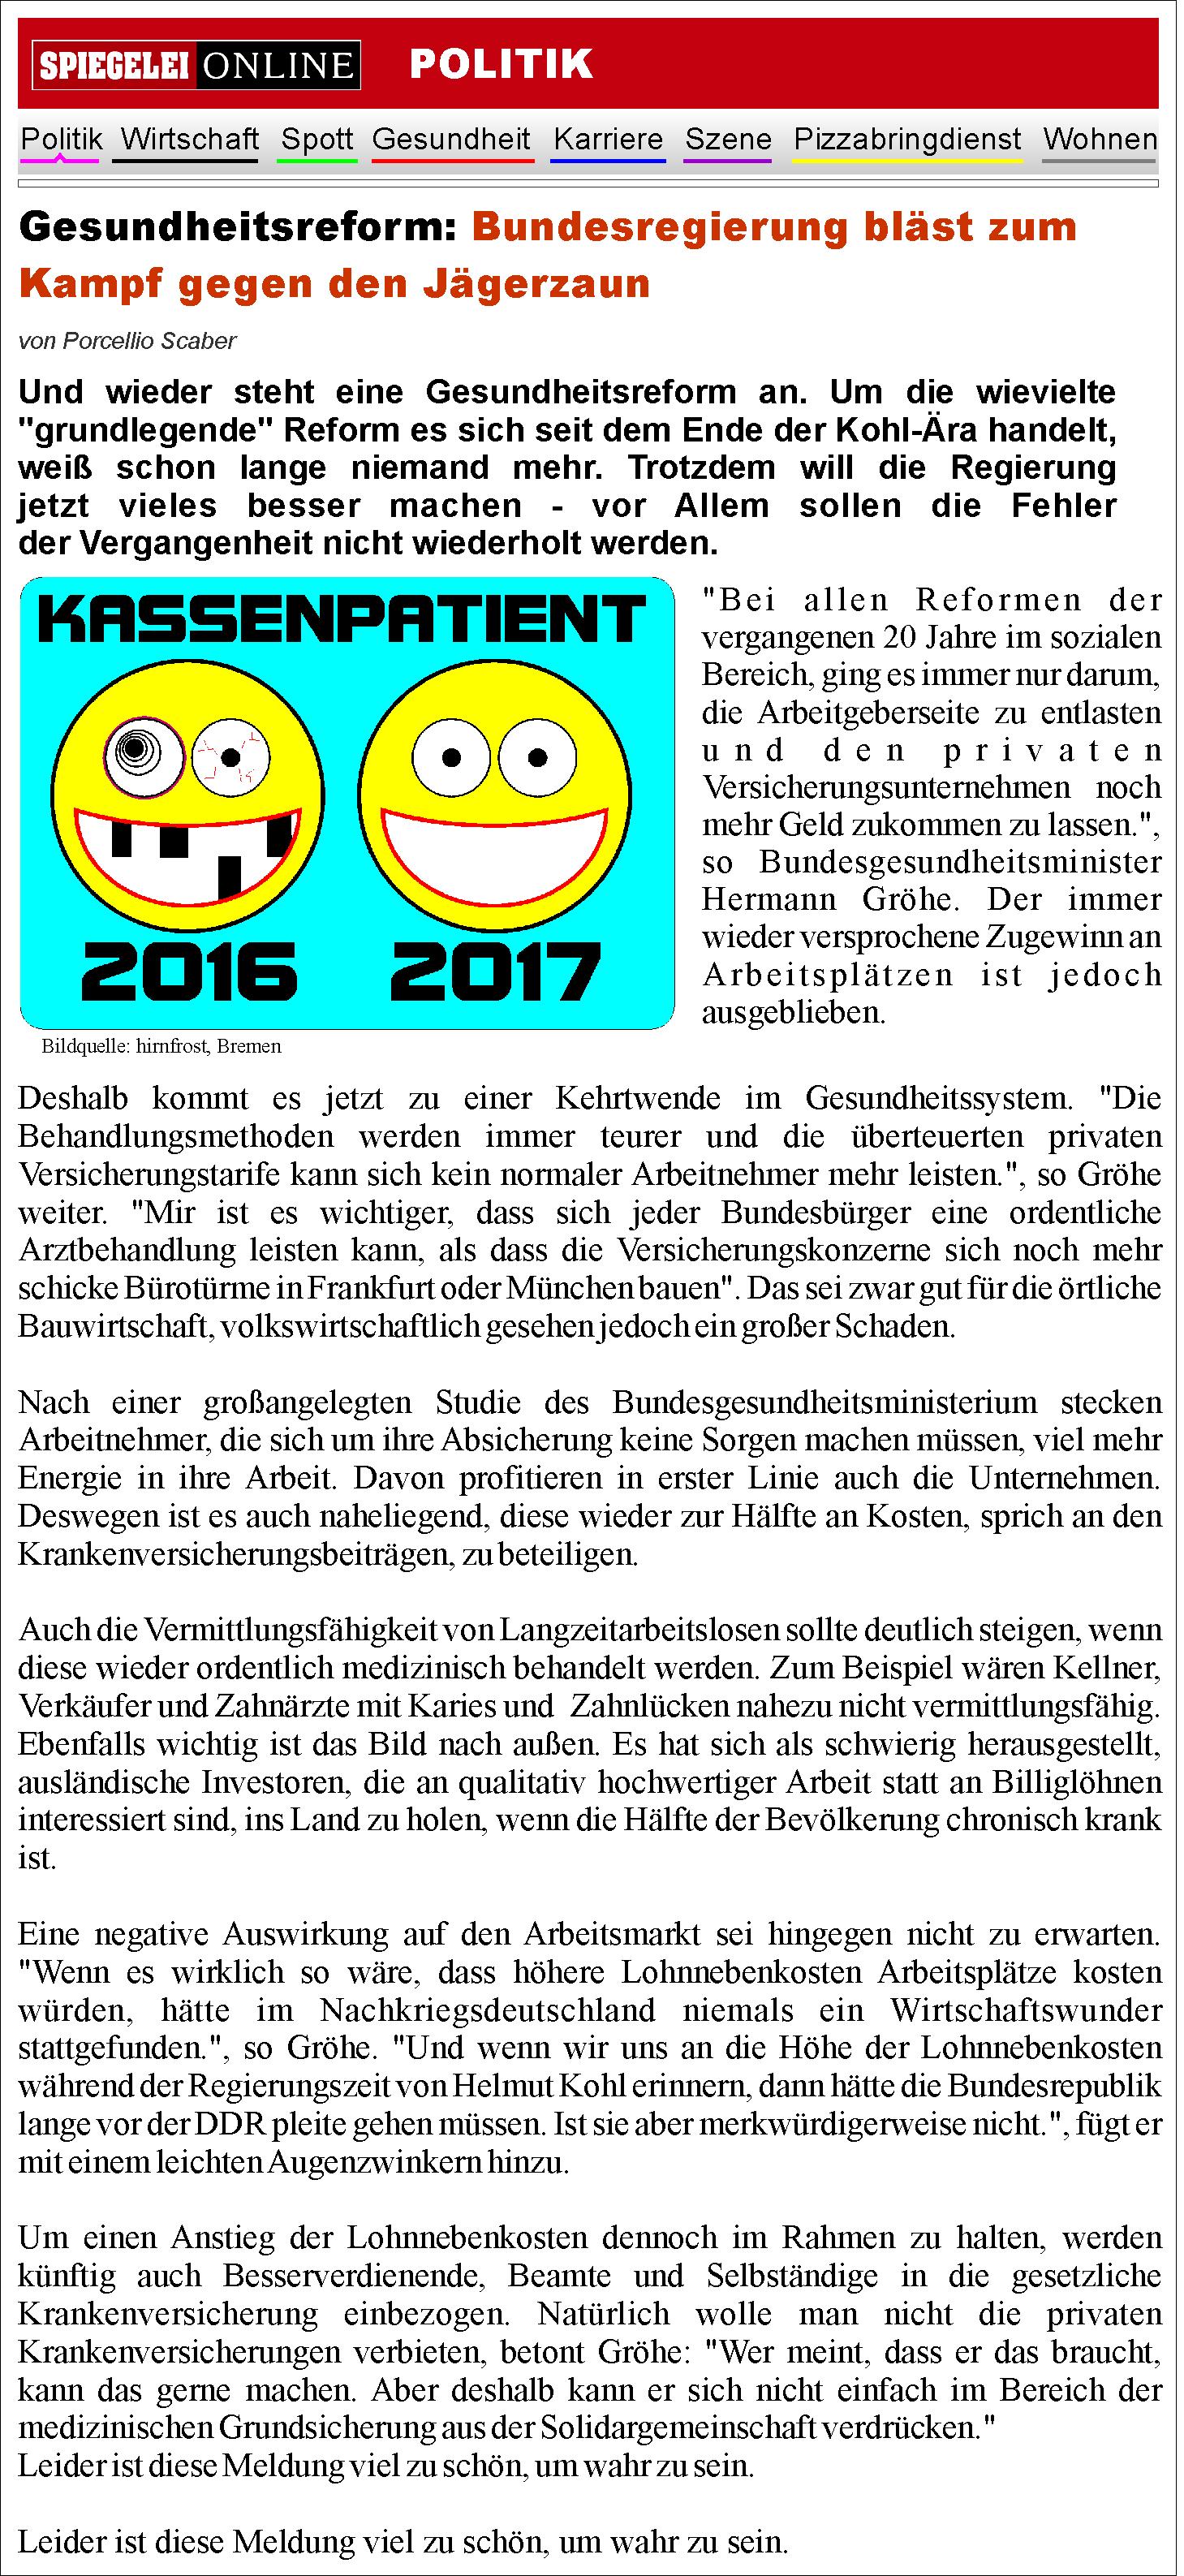 traummeldung_05